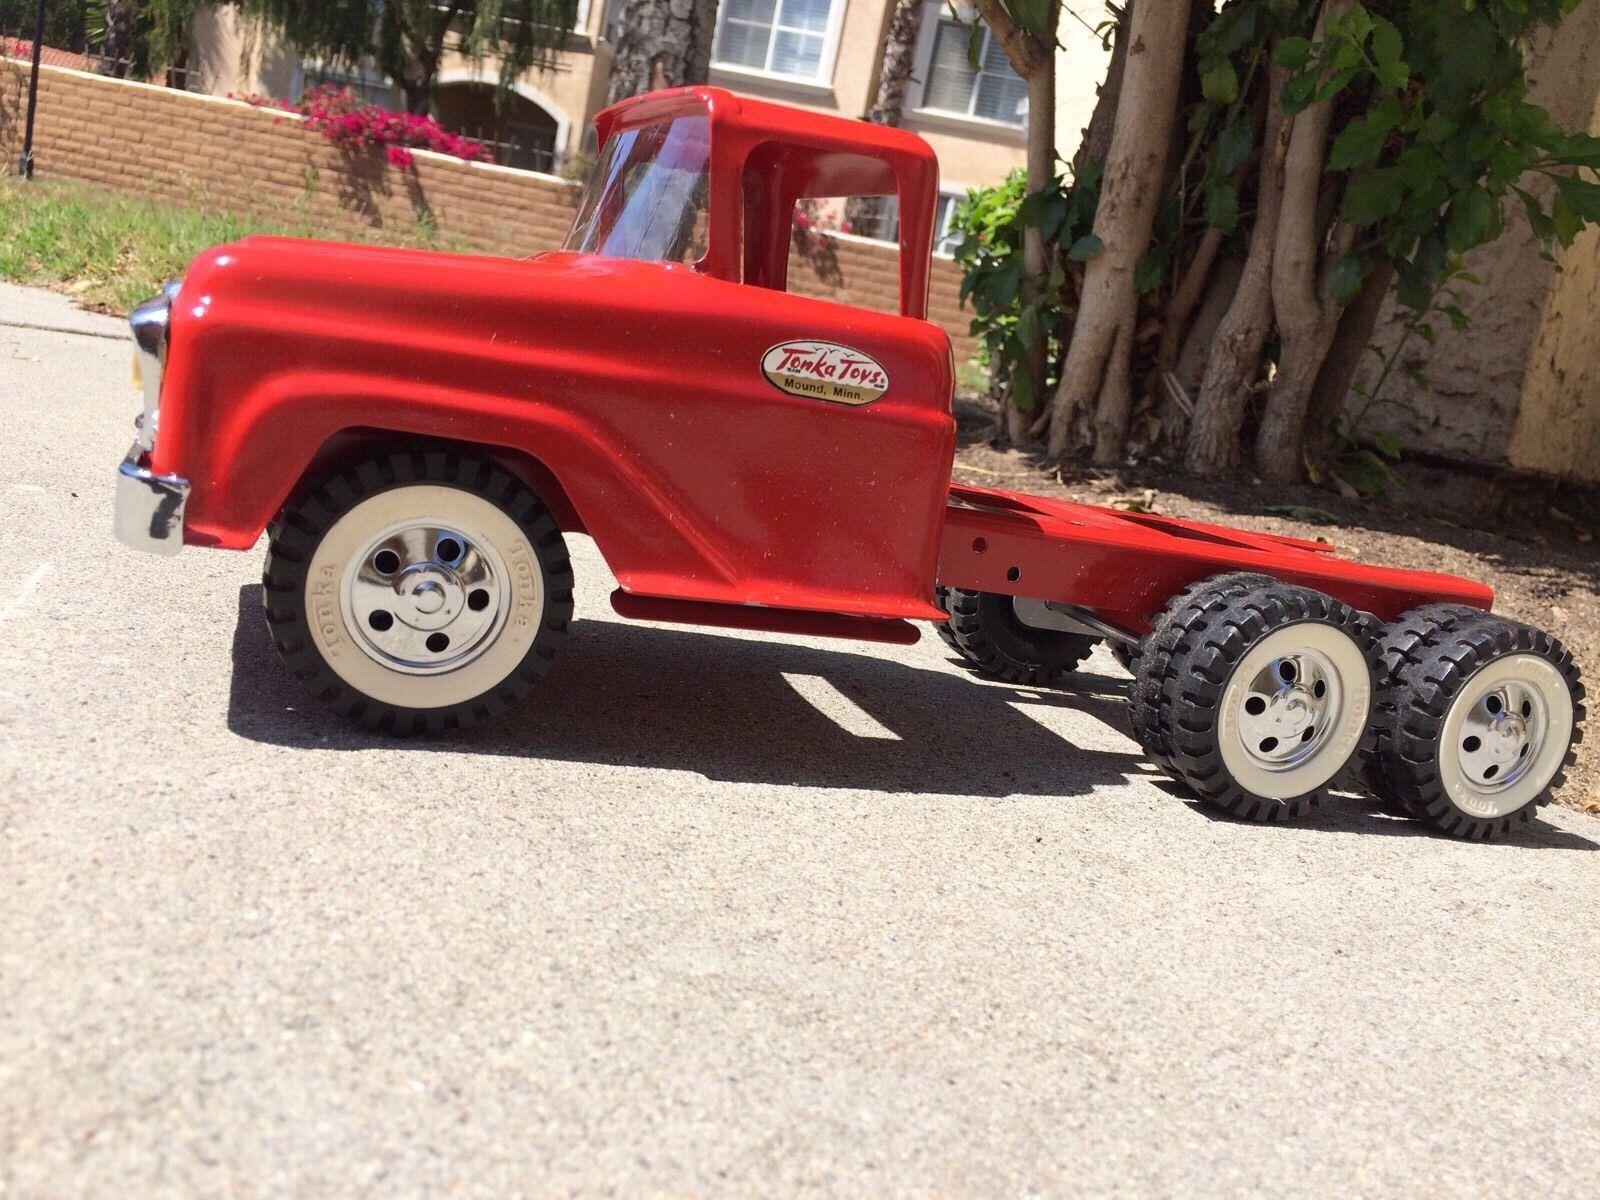 1958 Beautiful Custom Tonka Truck Display in Toys, Hobbies, Diecast Vehicles, Cars, Trucks & Vans | eBay